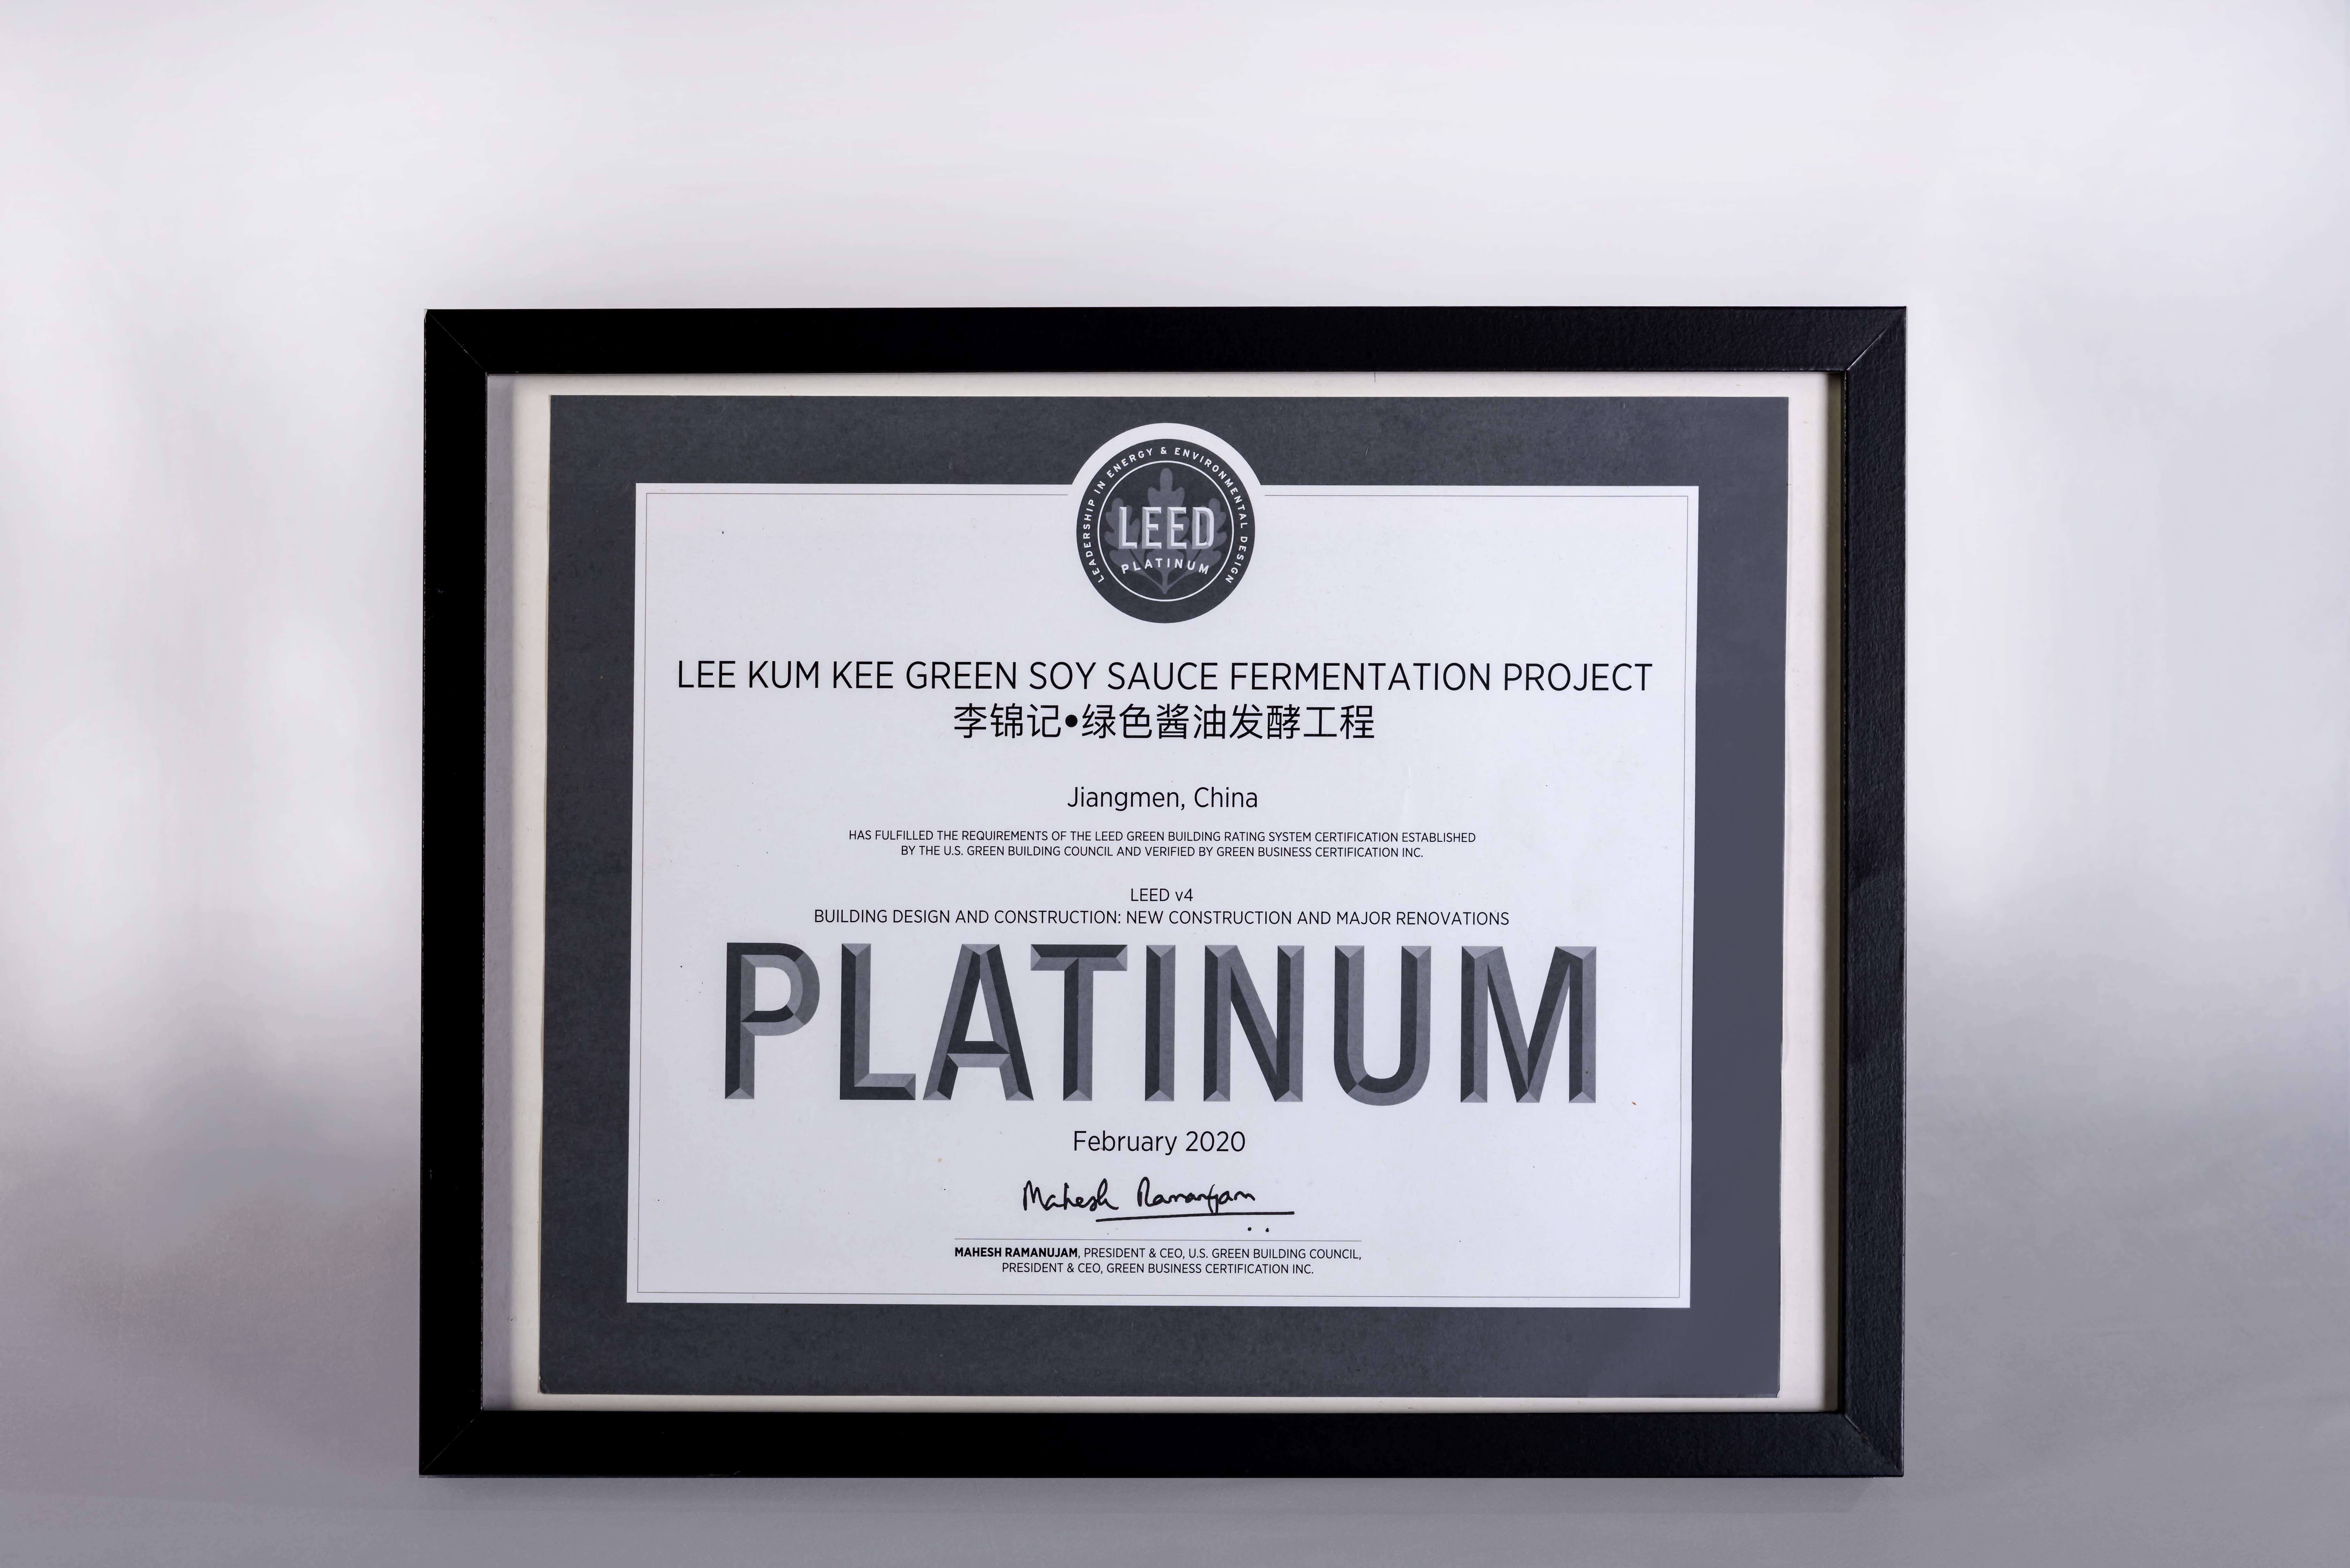 Lee Kum Kee Sauce Group Receives the LEED Platinum Certification